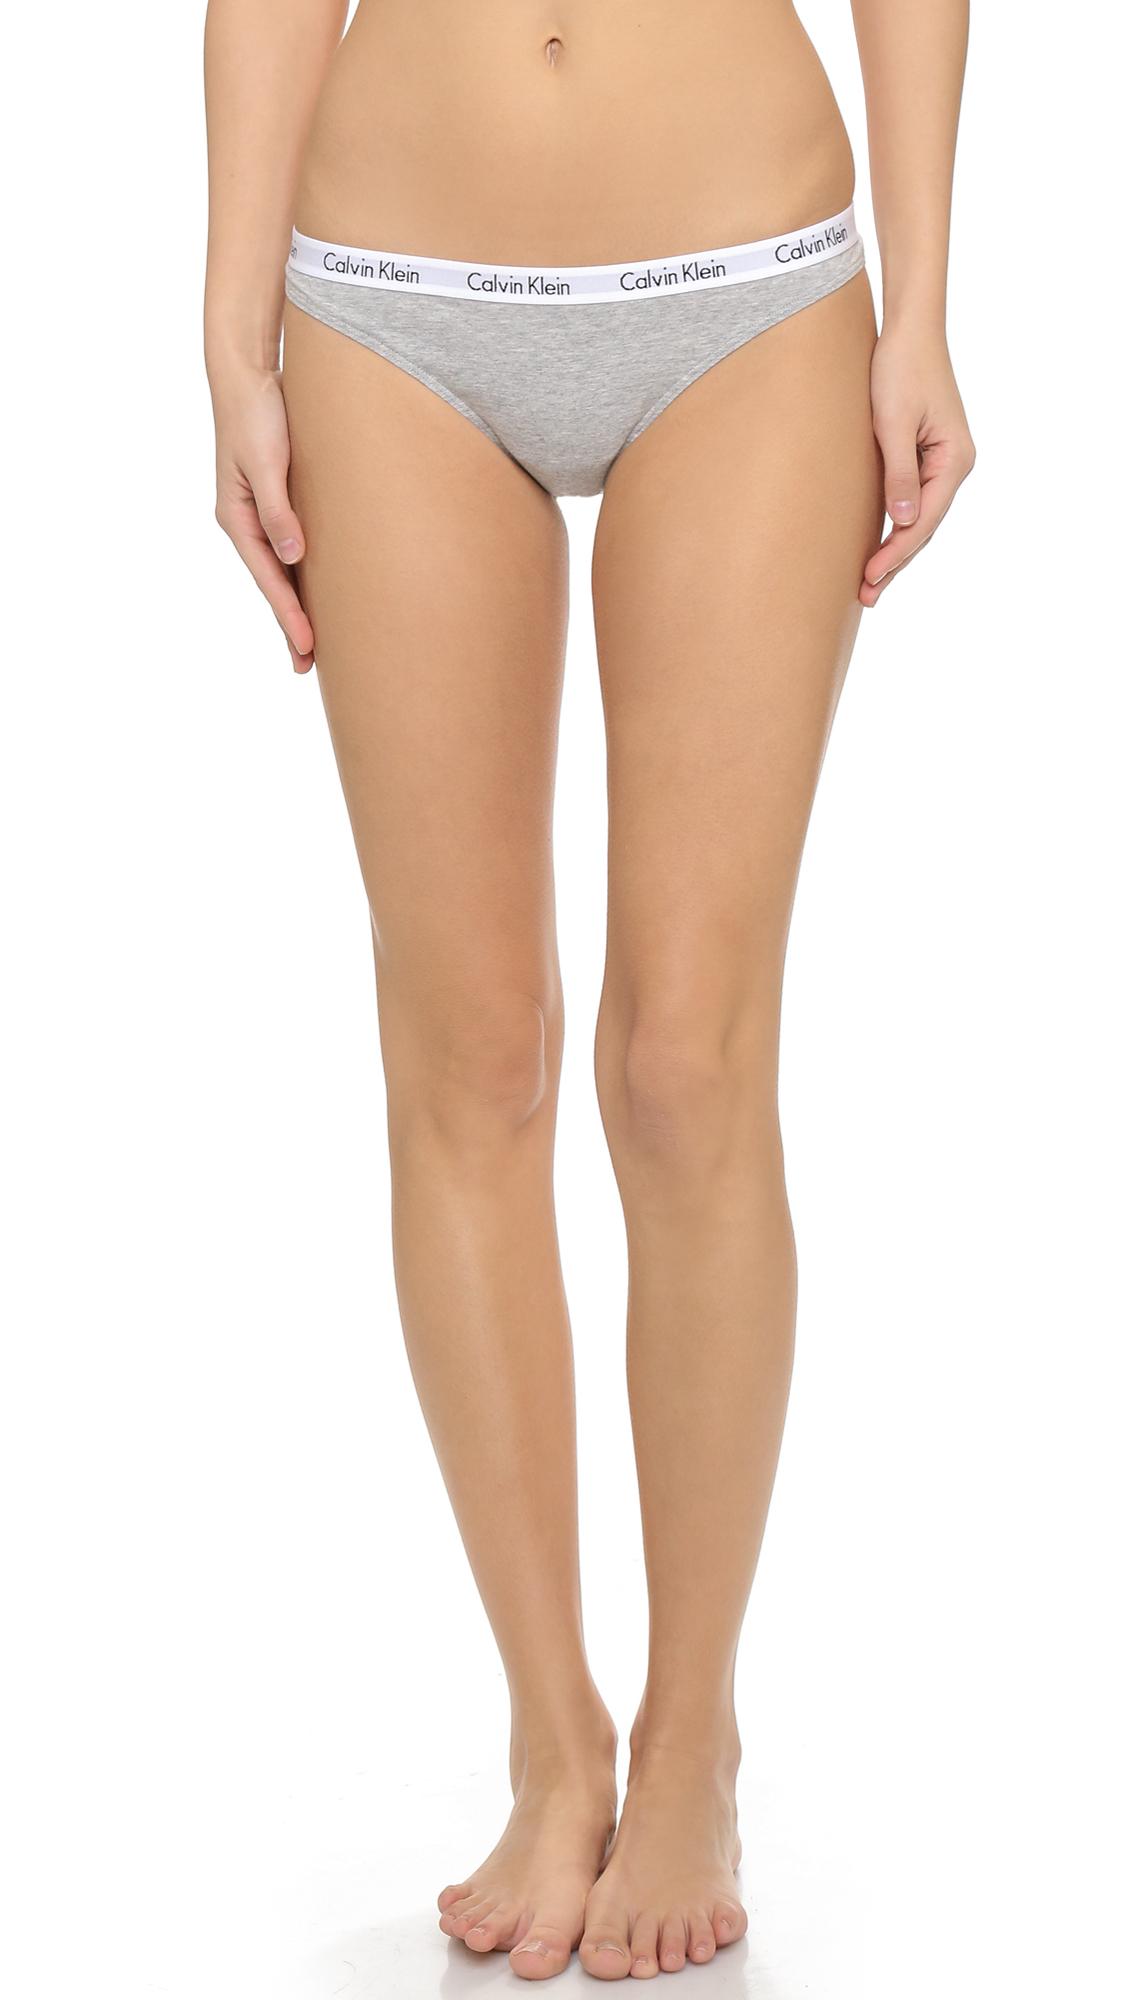 8edf8c4812 Calvin Klein Underwear Carousel Thong 3 Pack